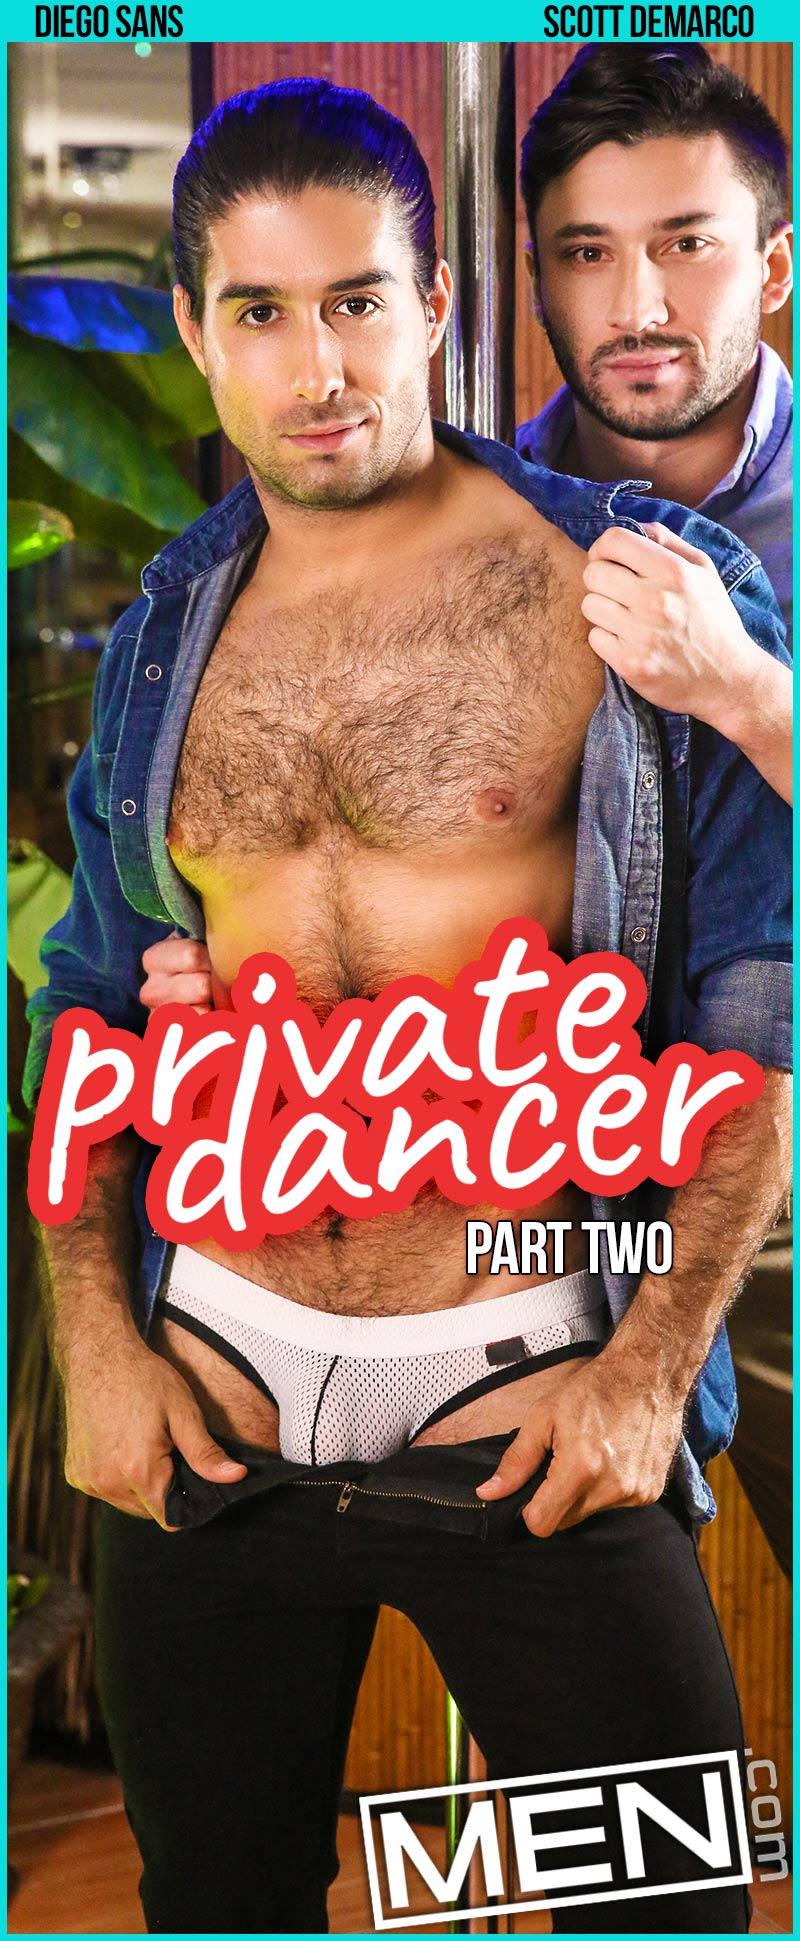 Private Dancer, Part Two (Diego Sans Fucks Scott Demarco) at MEN